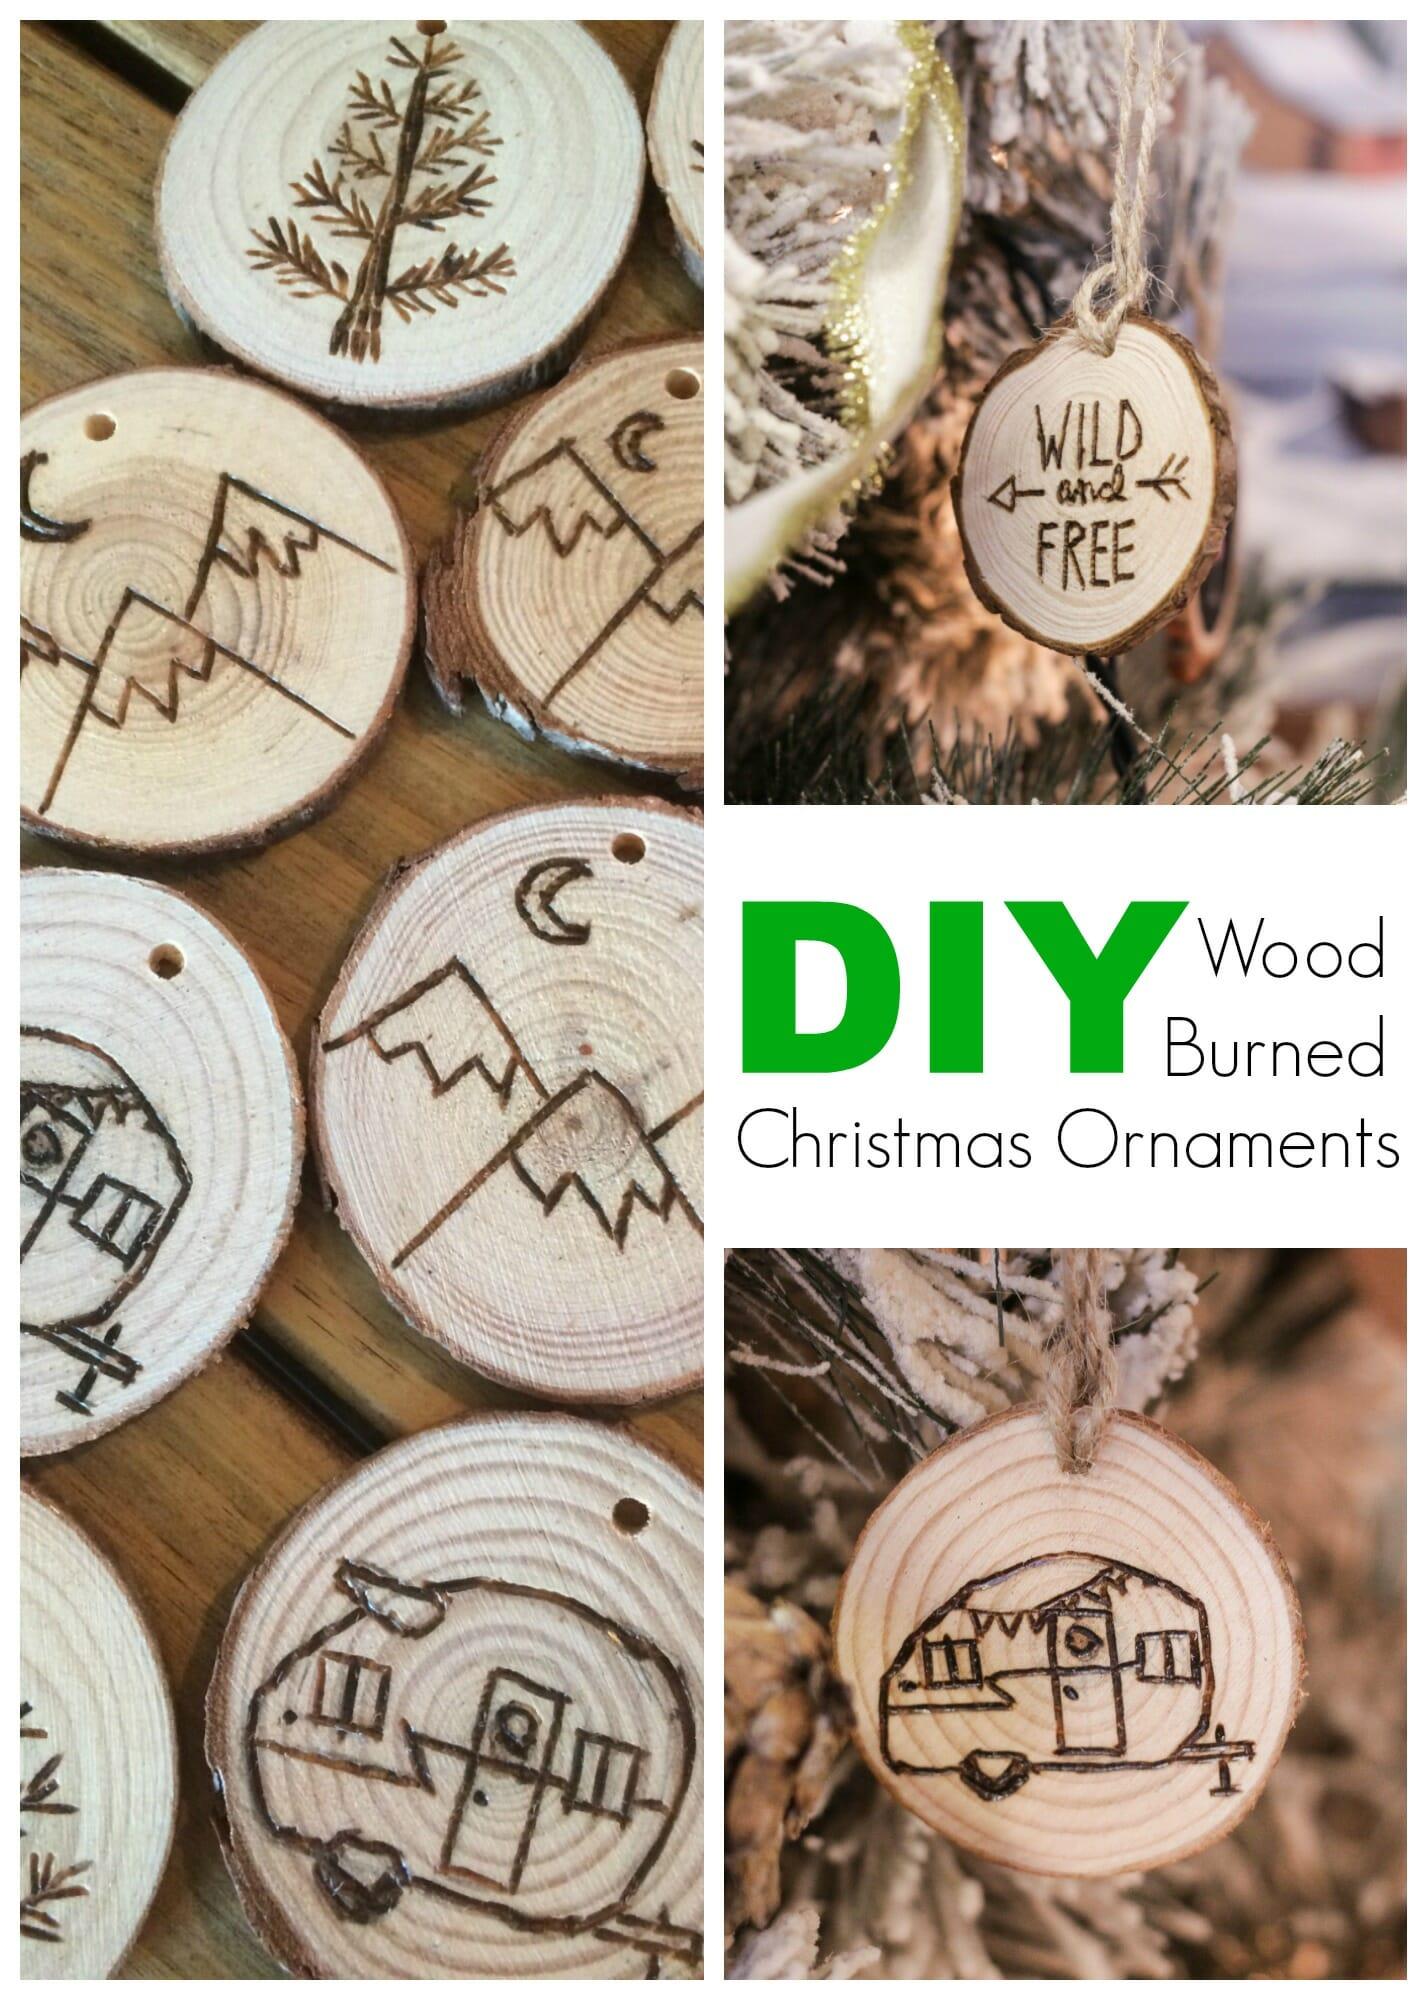 Uncategorized Diy Wooden Christmas Ornaments diy wood burned log slice ornaments cassie bustamante christmas ornaments